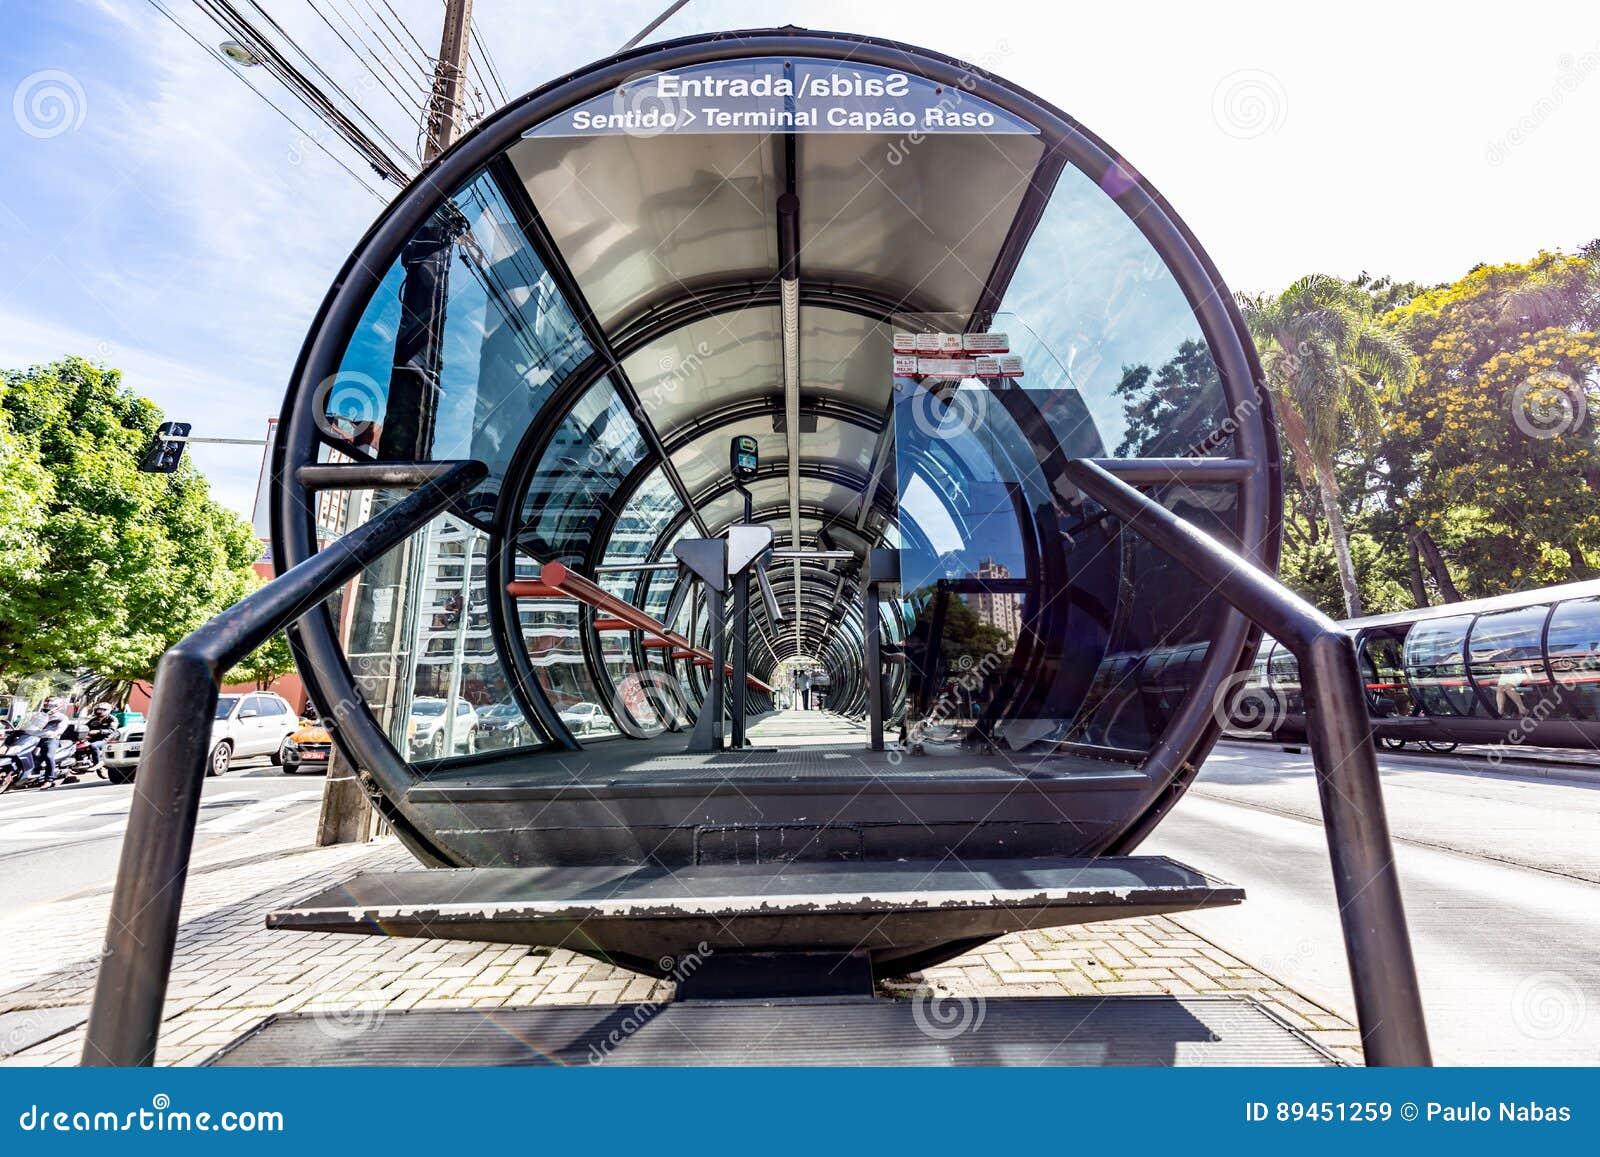 CURITIBA, PARANA/BRAZIL - 27-ОЕ ДЕКАБРЯ 2016: Автобусная остановка